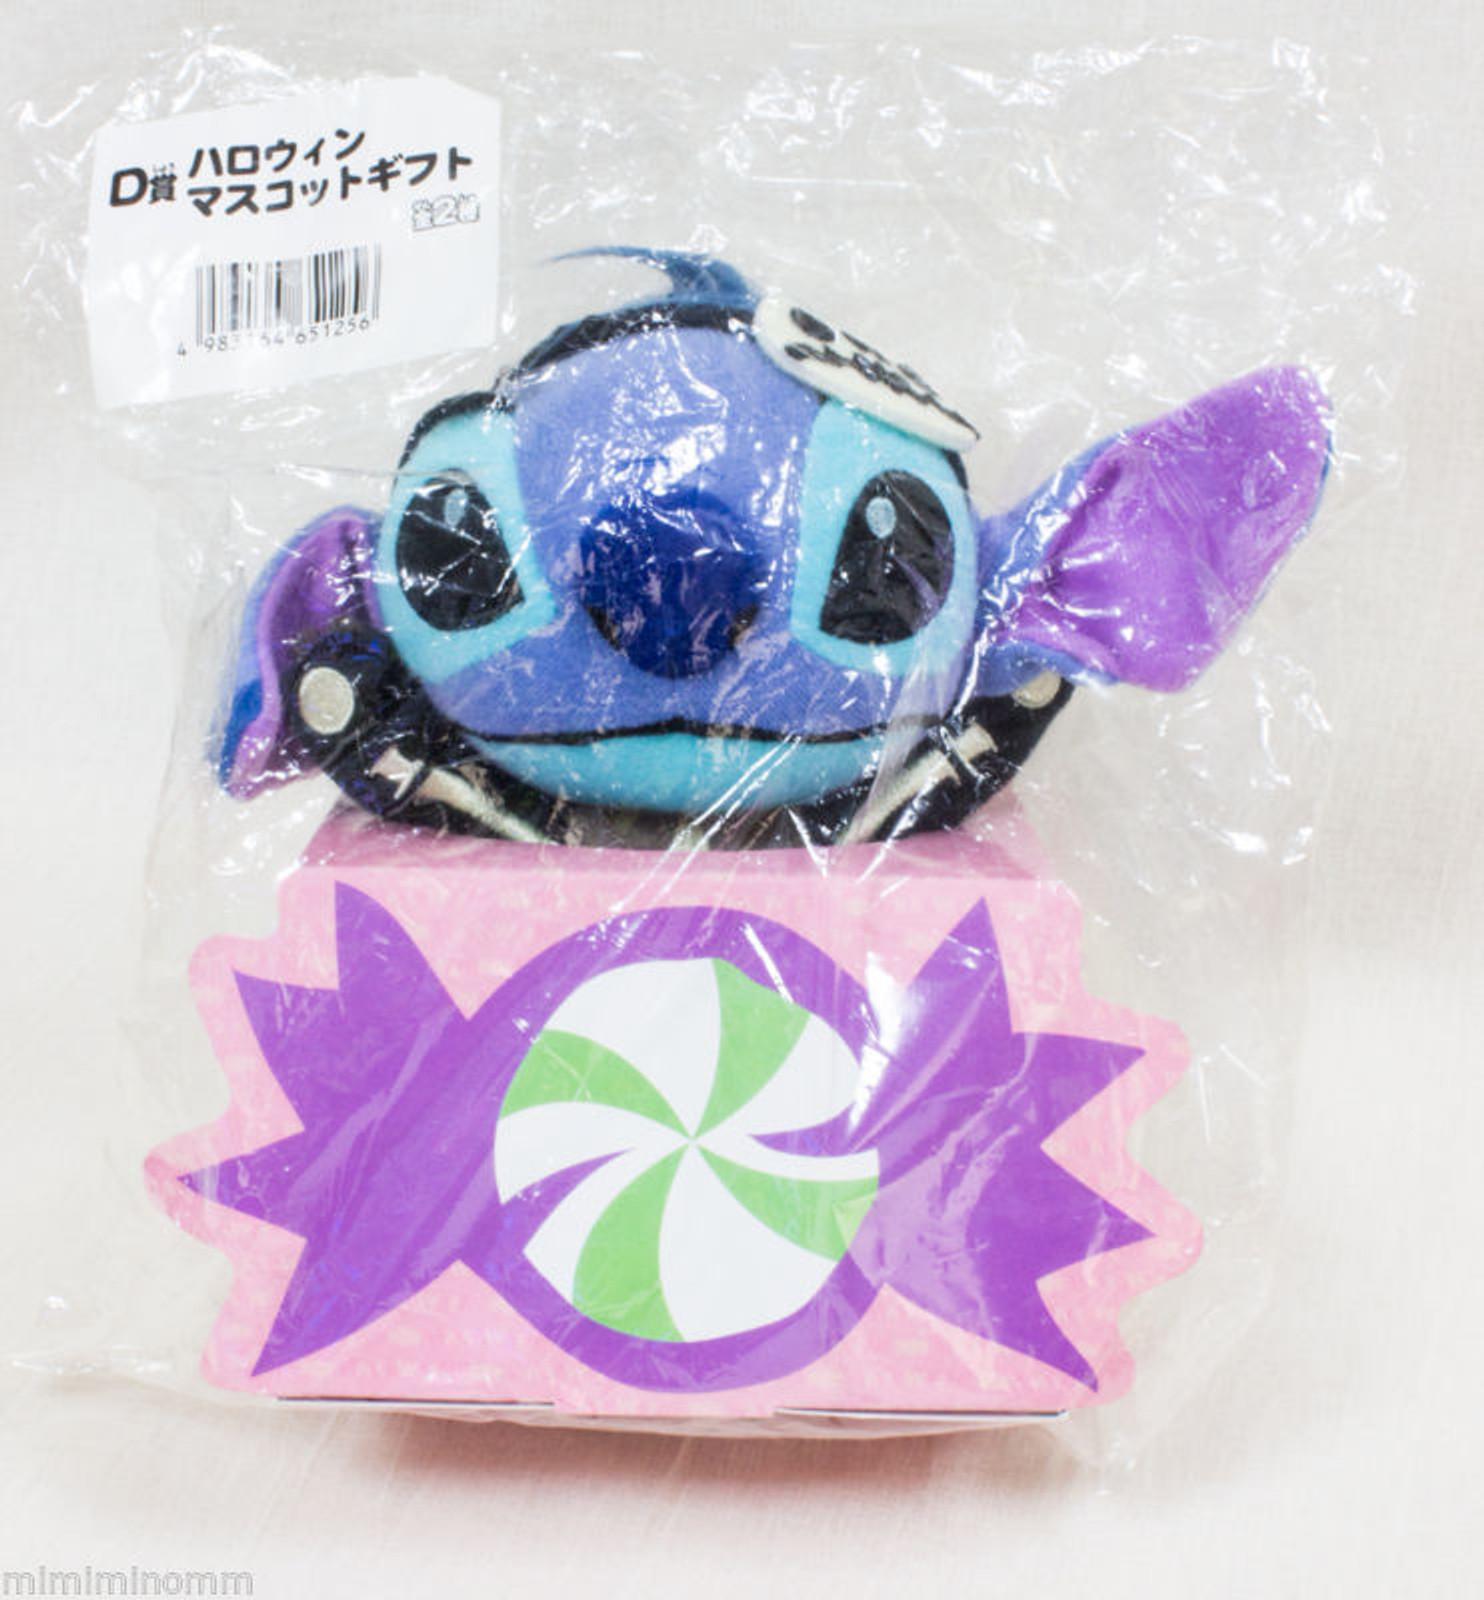 Disney Stitch 8 inch Plush doll Halloween Mascot Figure Banpresto JAPAN